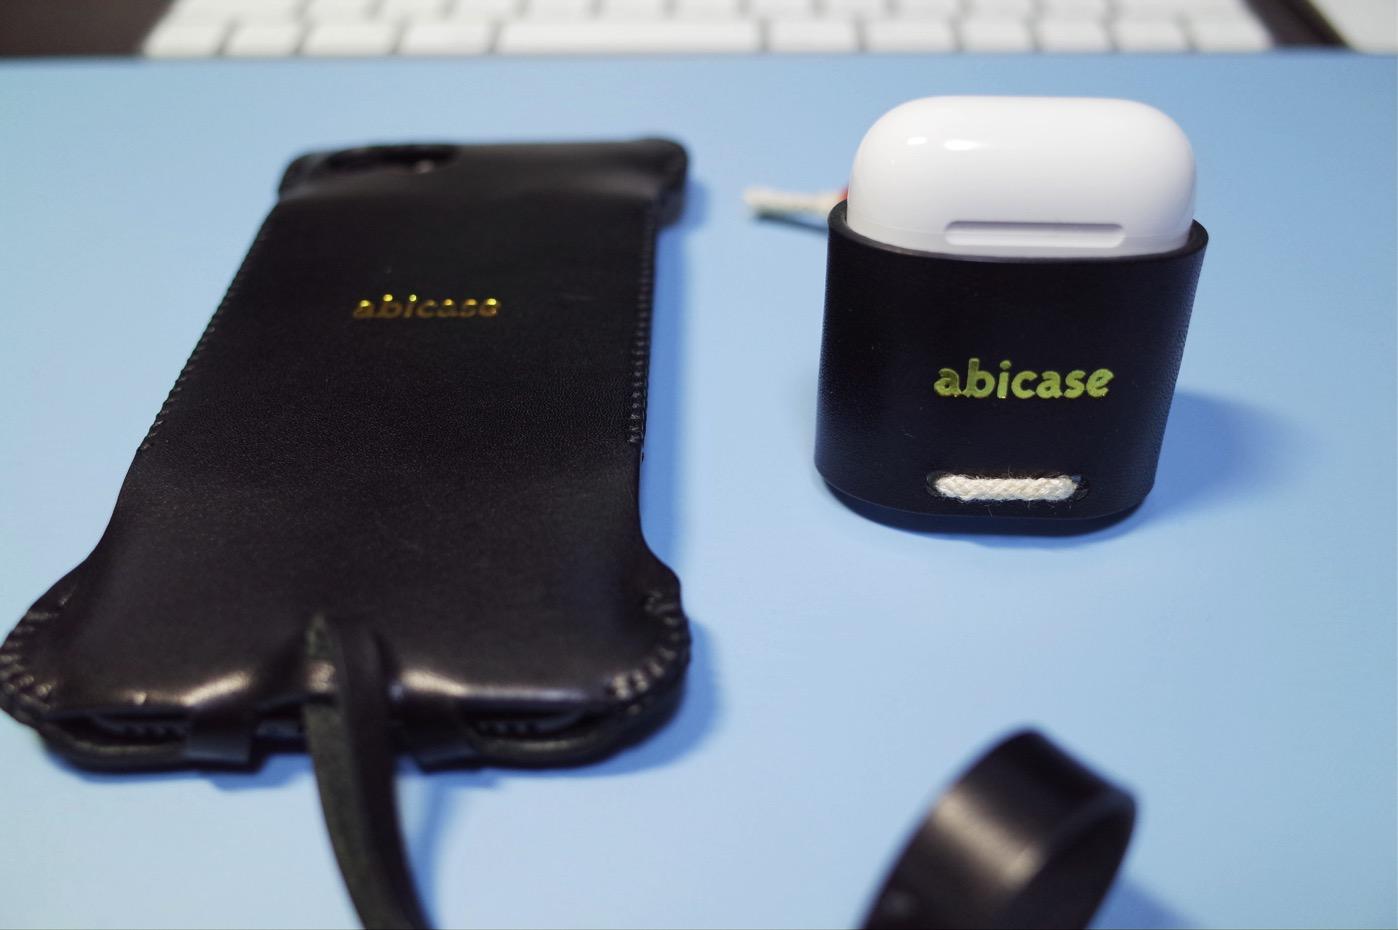 iPhone 7 ジェットブラック & abicase-2